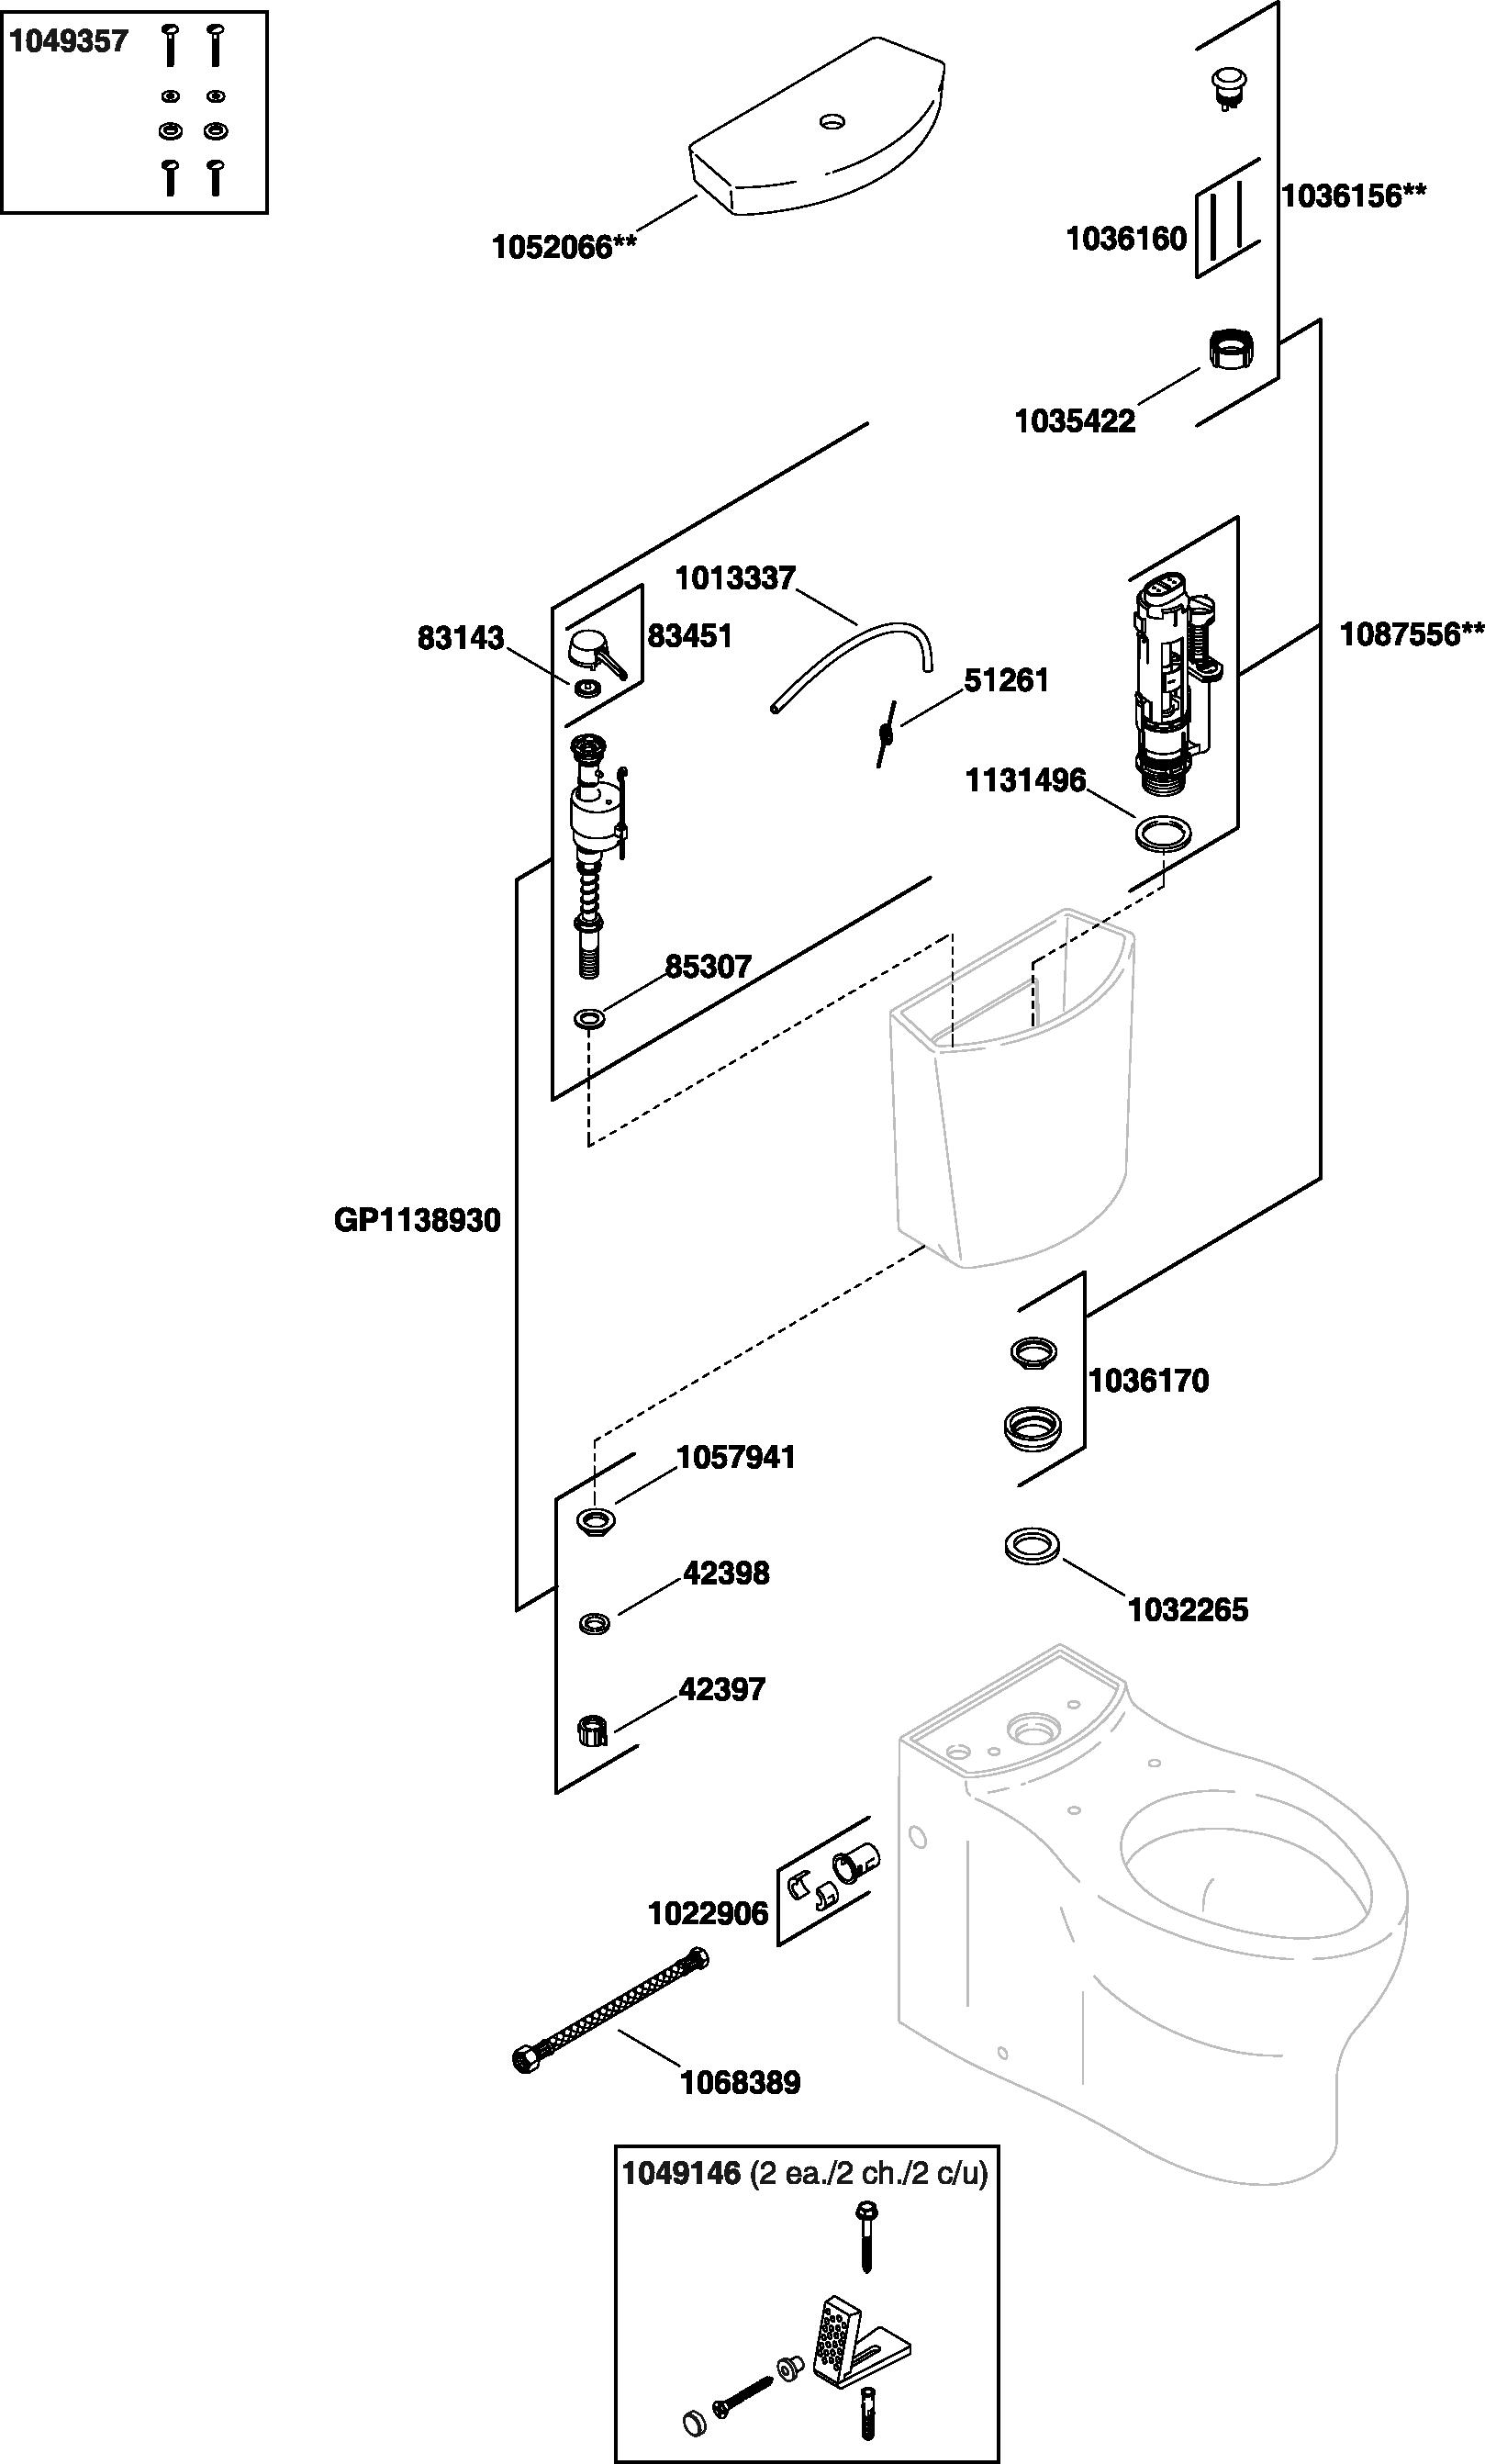 Kohler K-3654 Persuade Toilet Parts